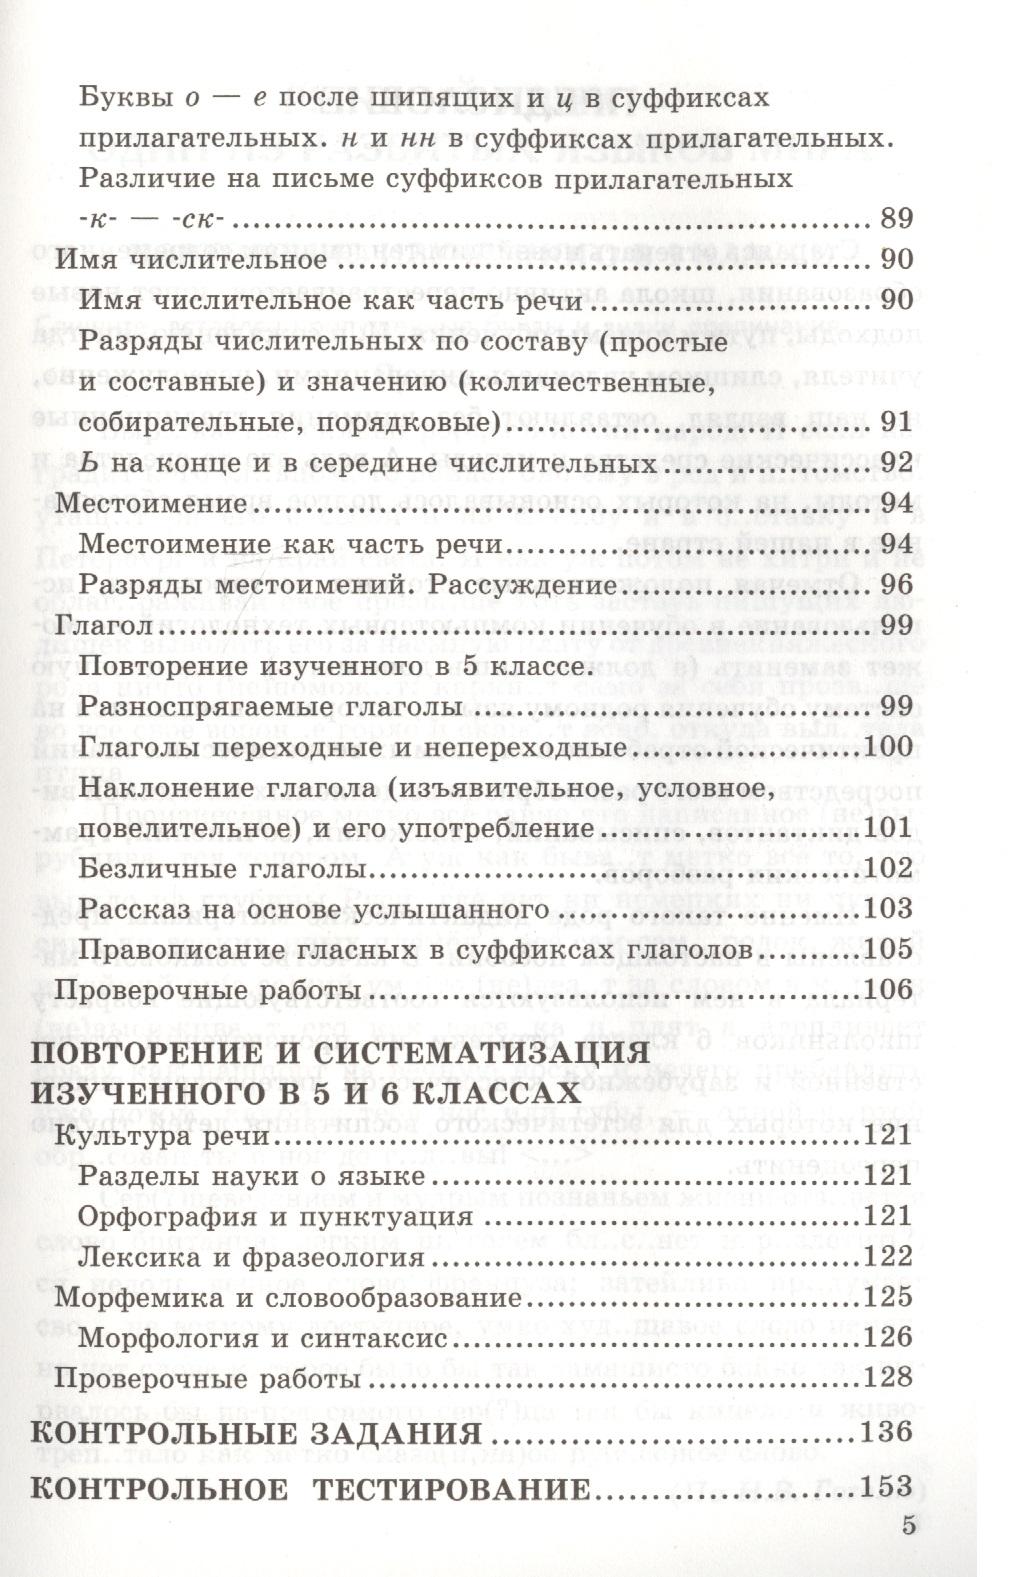 Издательство мнемозина москва 2018 гдз по русскому за 6 класс